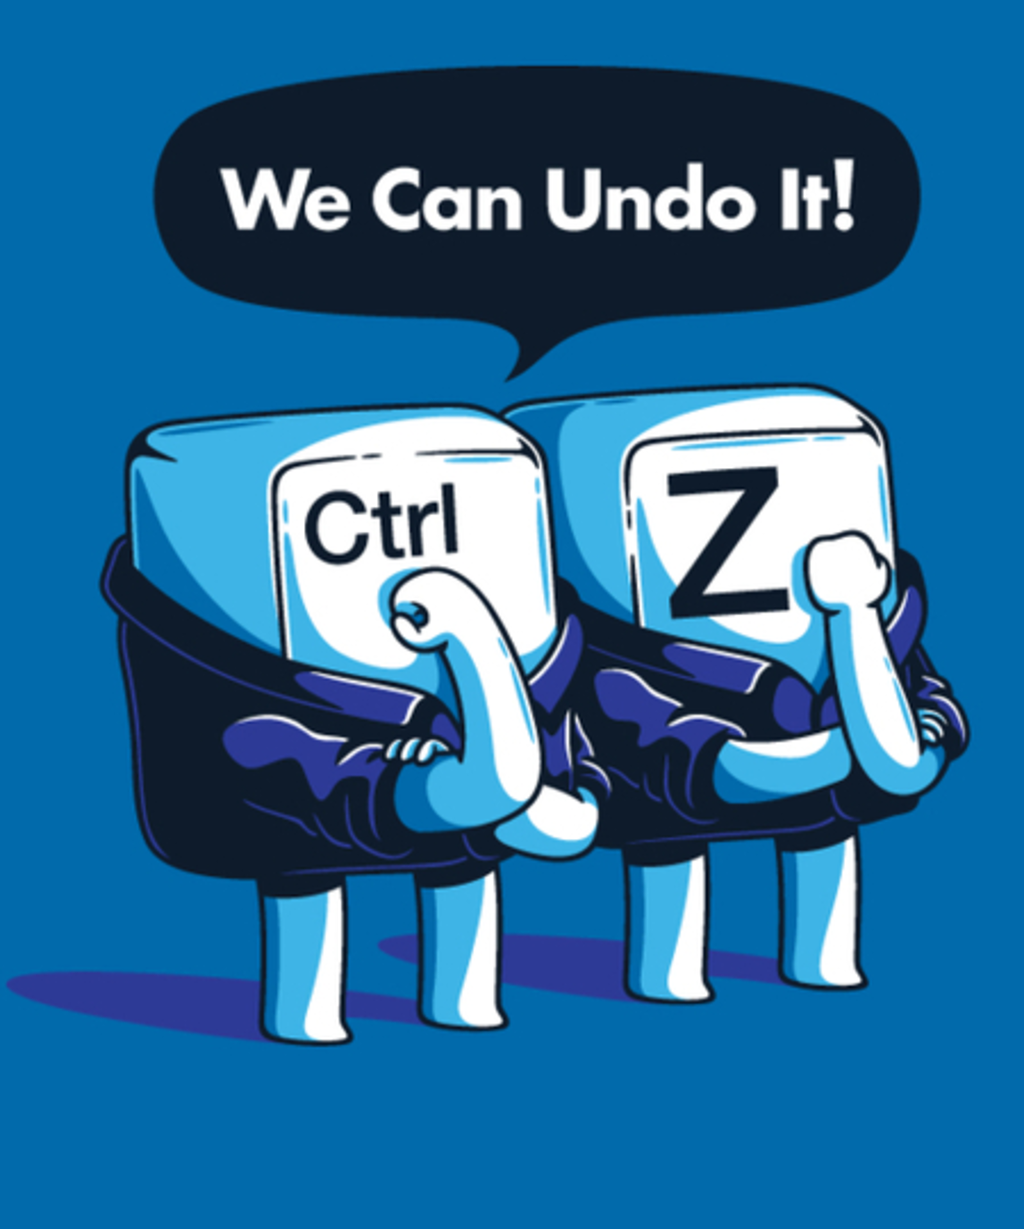 Qwertee: We Can Undo It!